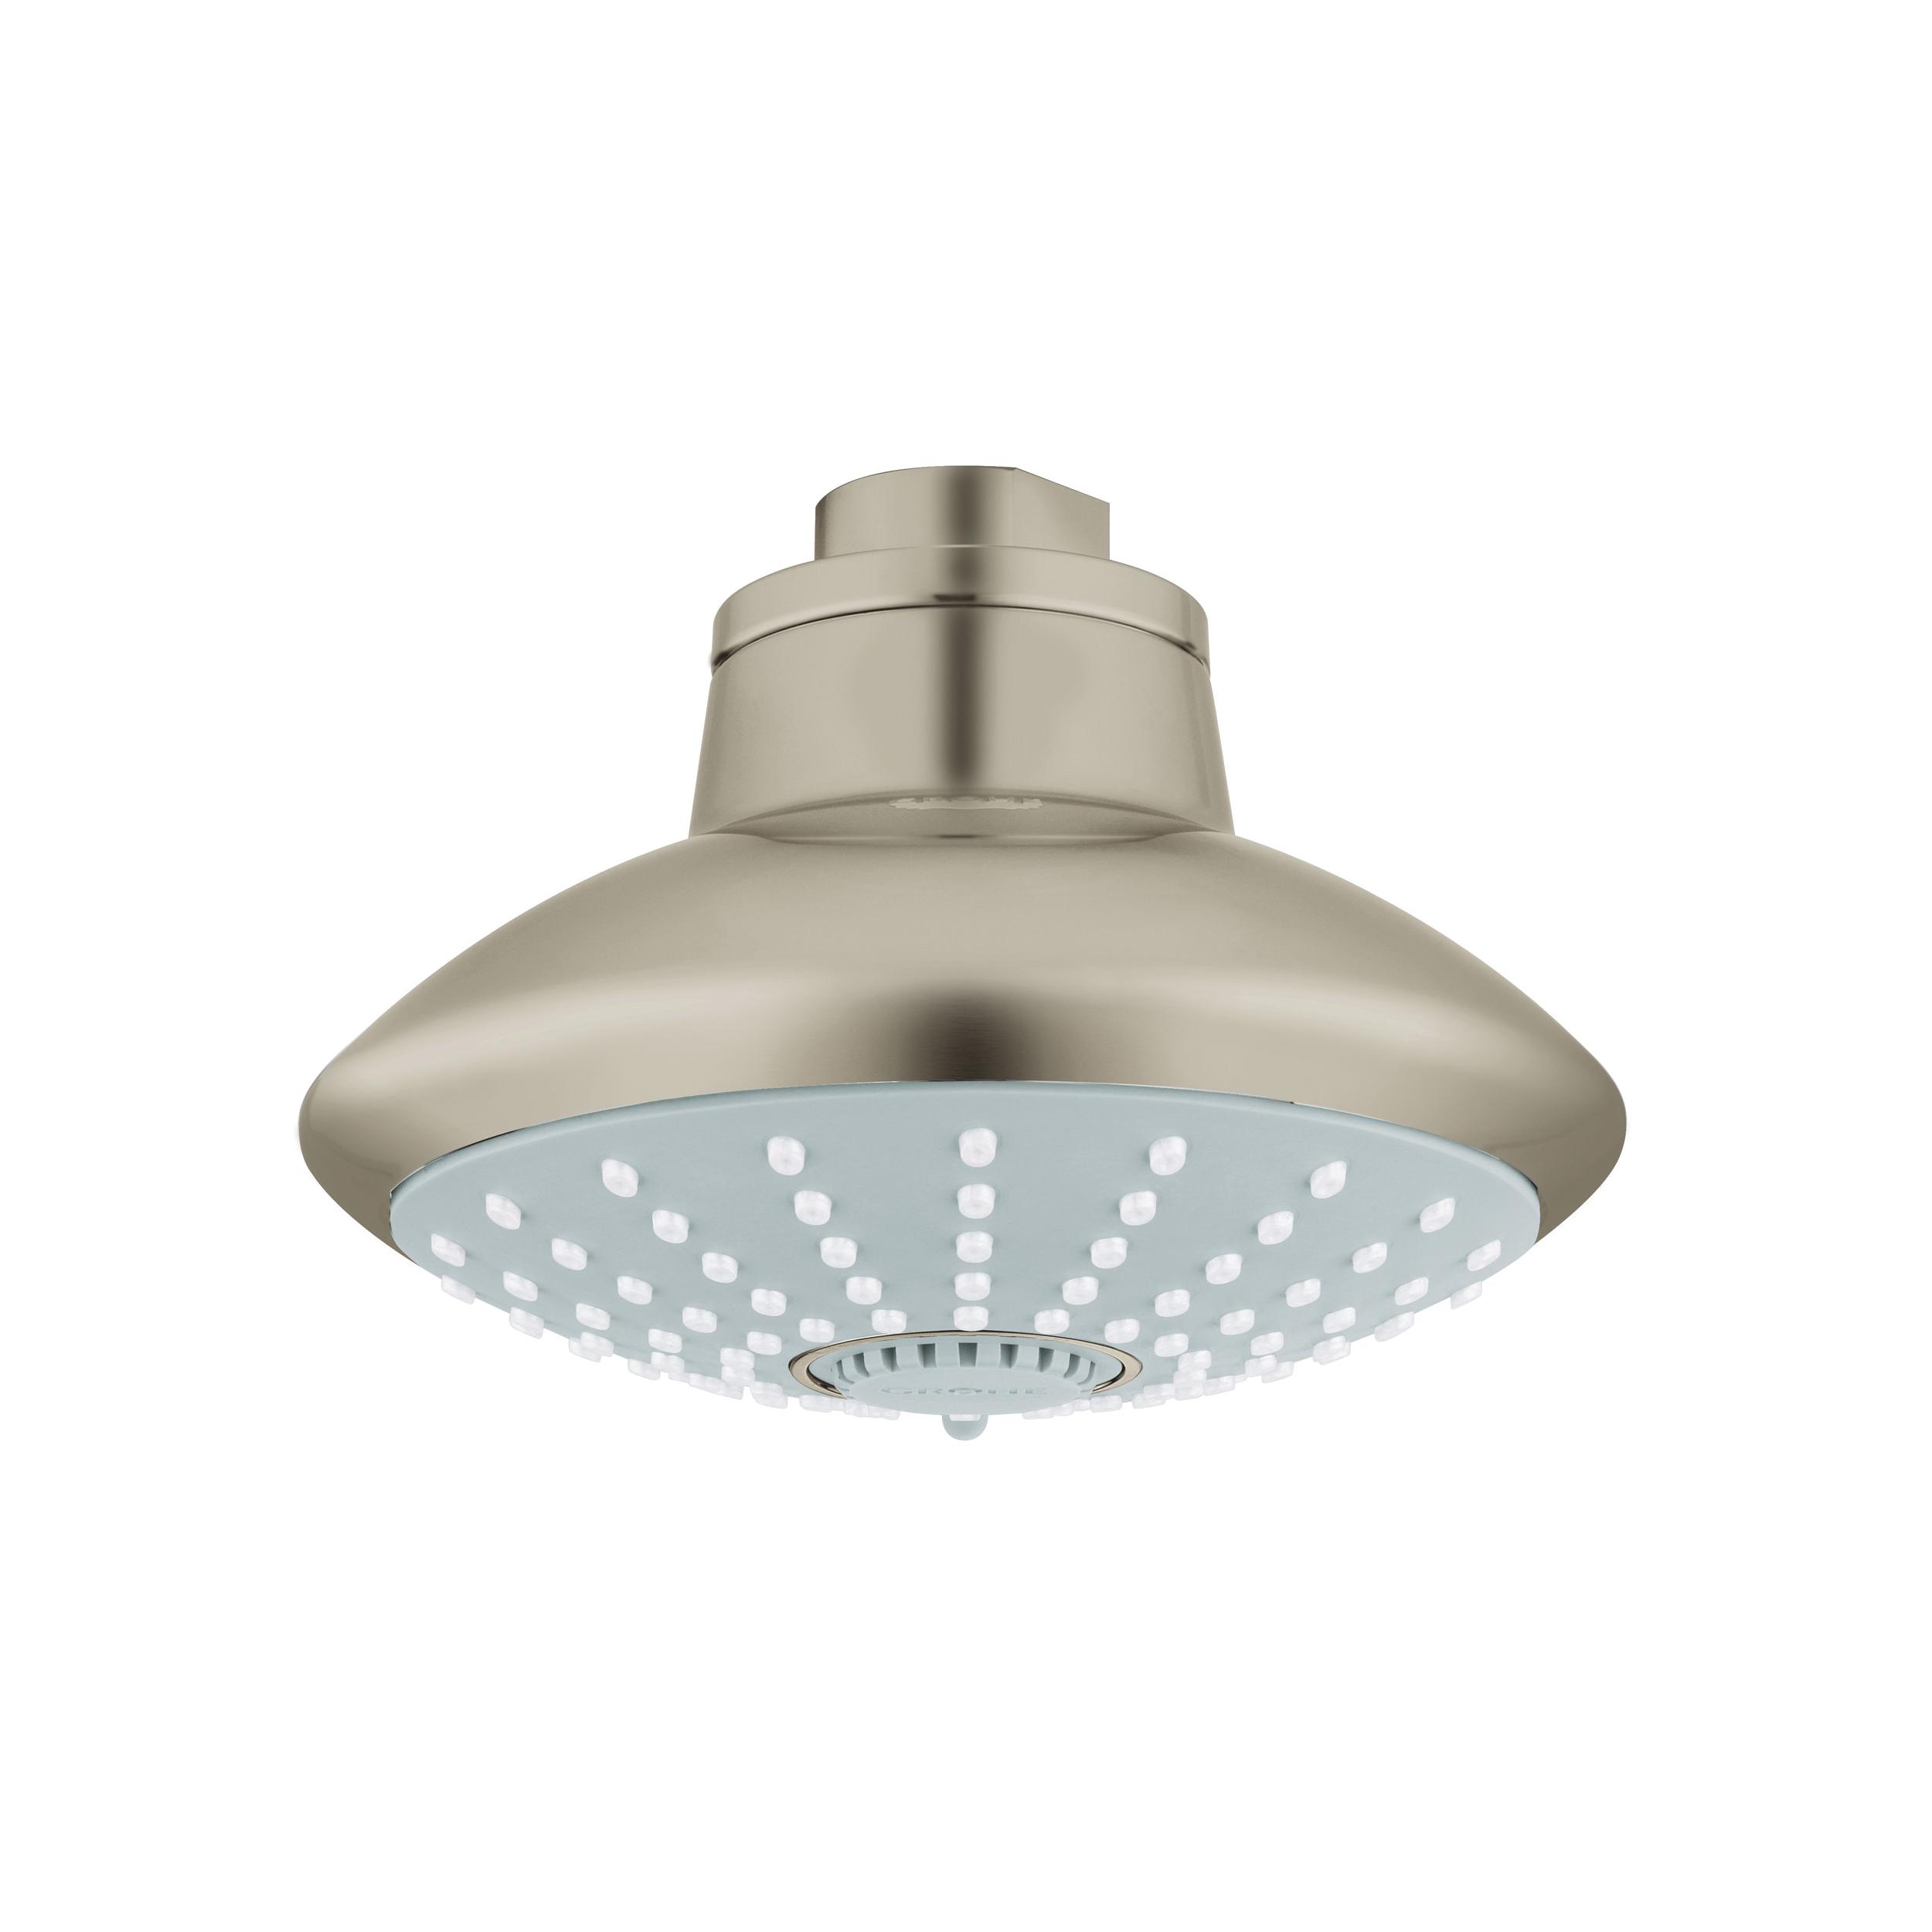 GROHE 27247EN1 Euphoria 110 Shower Head, 2.5 gpm, 3 Sprays, Wall Mount, 4.62 in Head, Import